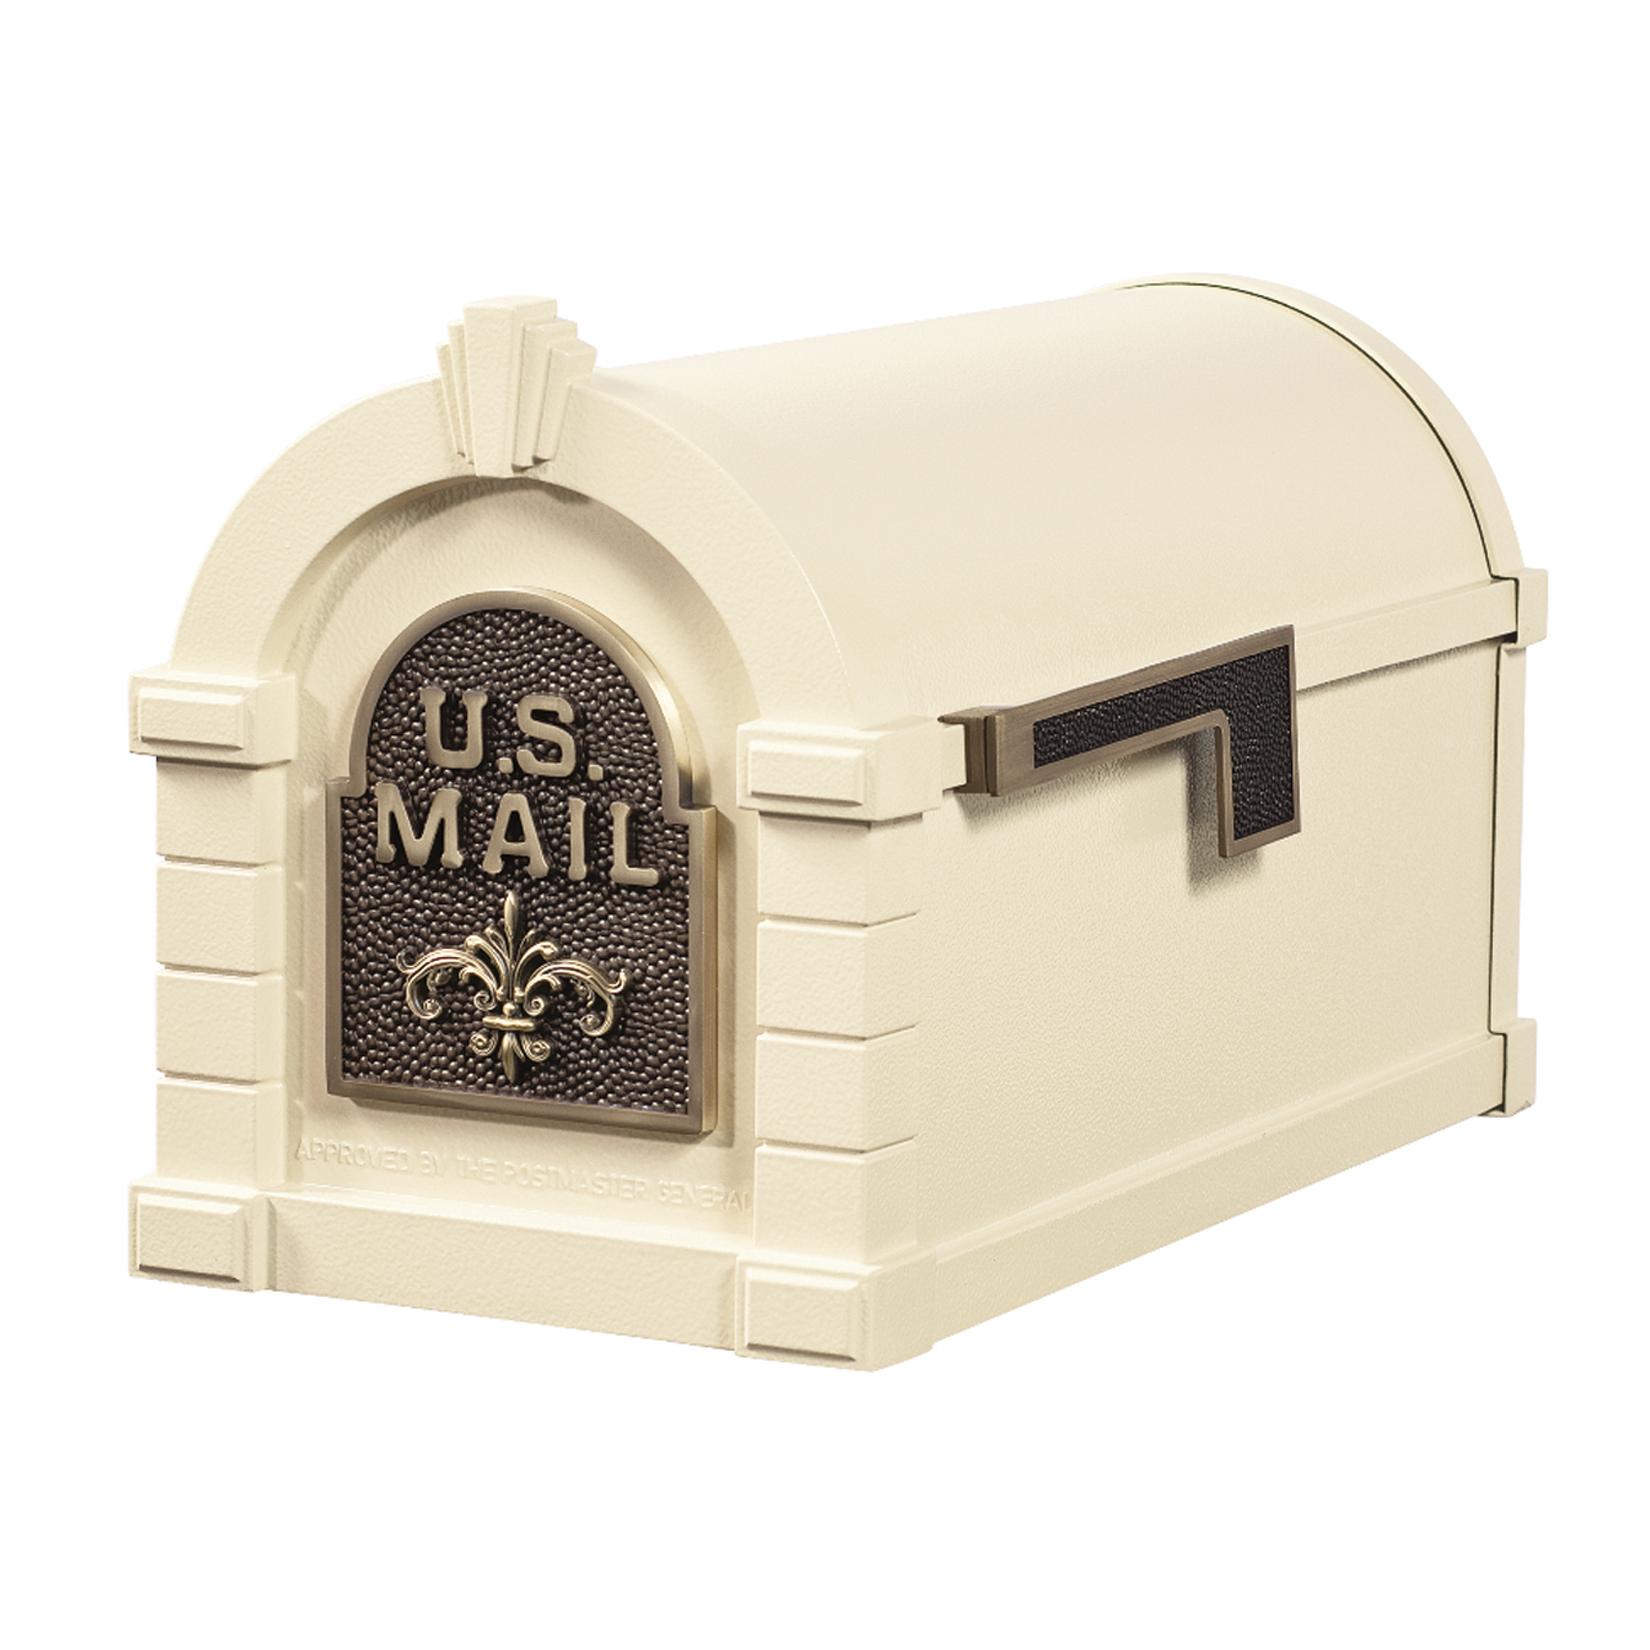 Gaines Fleur De Lis Keystone MailboxesAlmond with Satin Nickel